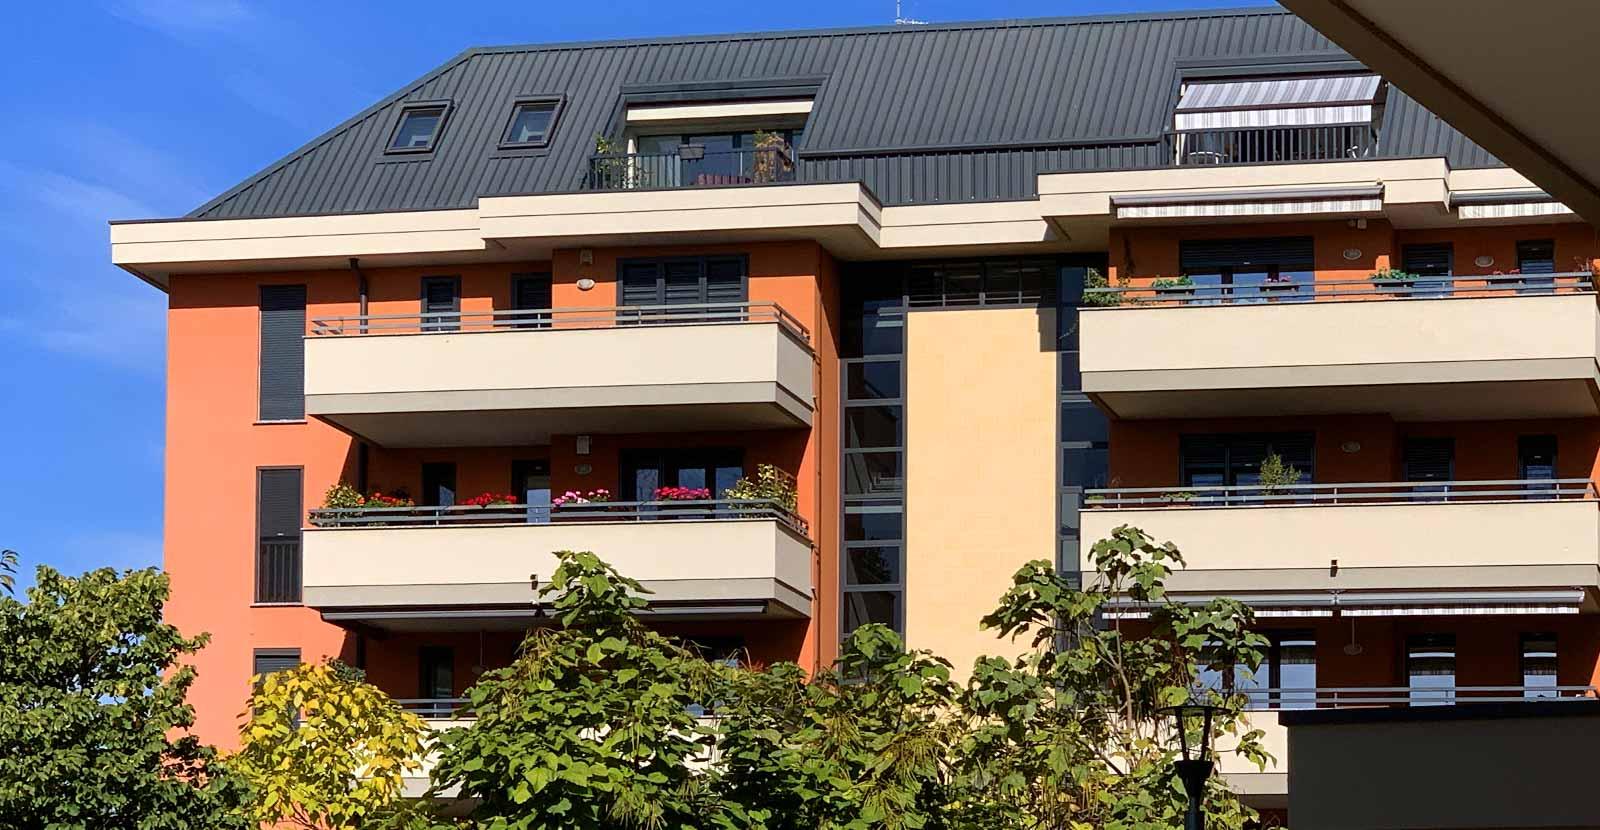 terrazze ripamonti milano 03